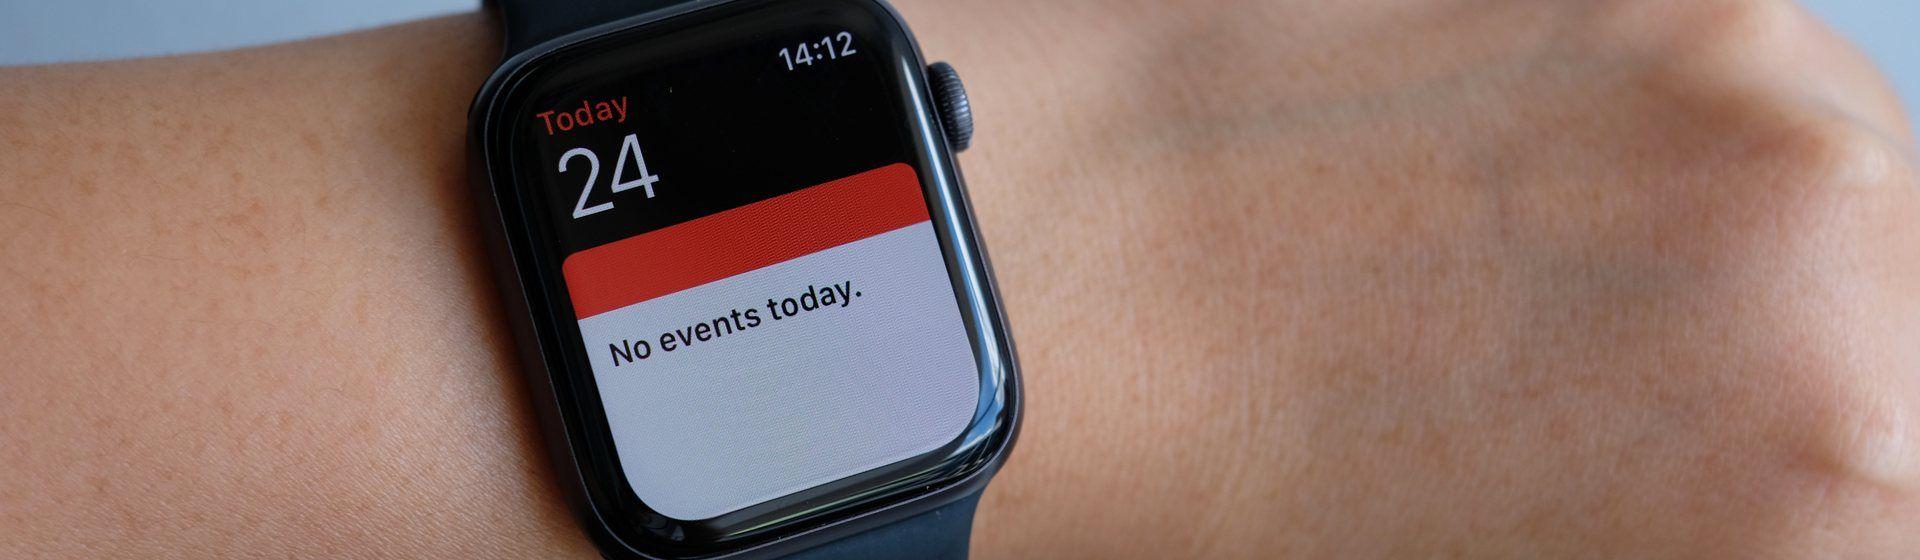 Apple Watch 5 ainda vale a pena? Veja a análise do relógio